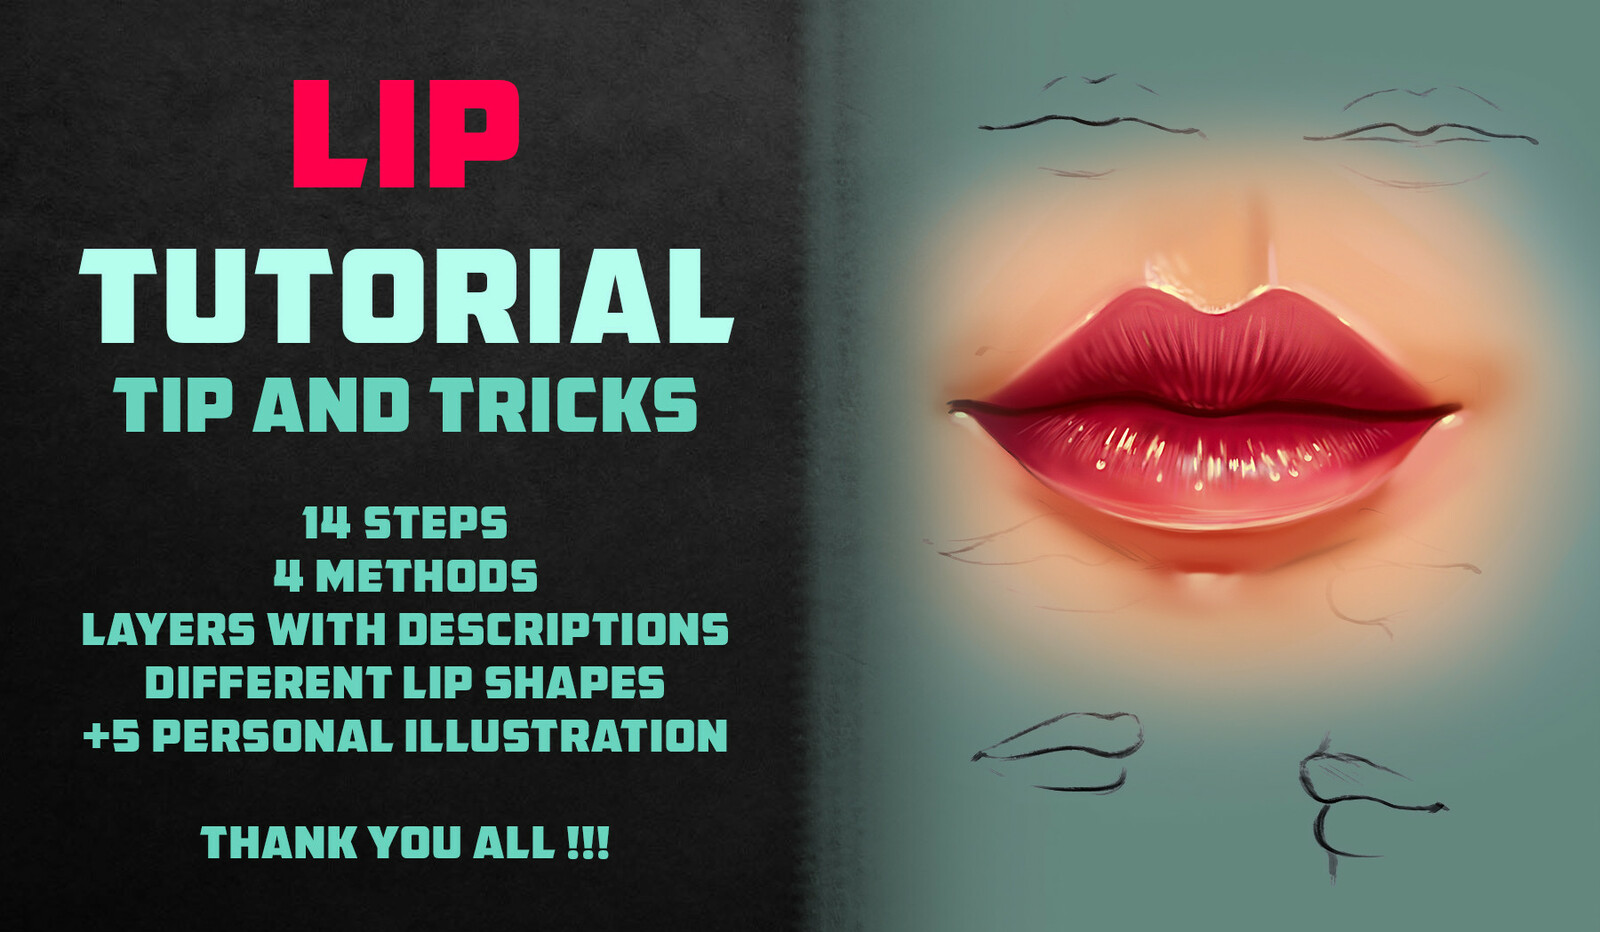 https://www.artstation.com/vurdem/store/RNgn/lip-tutorial-tip-and-tricks-photoshop